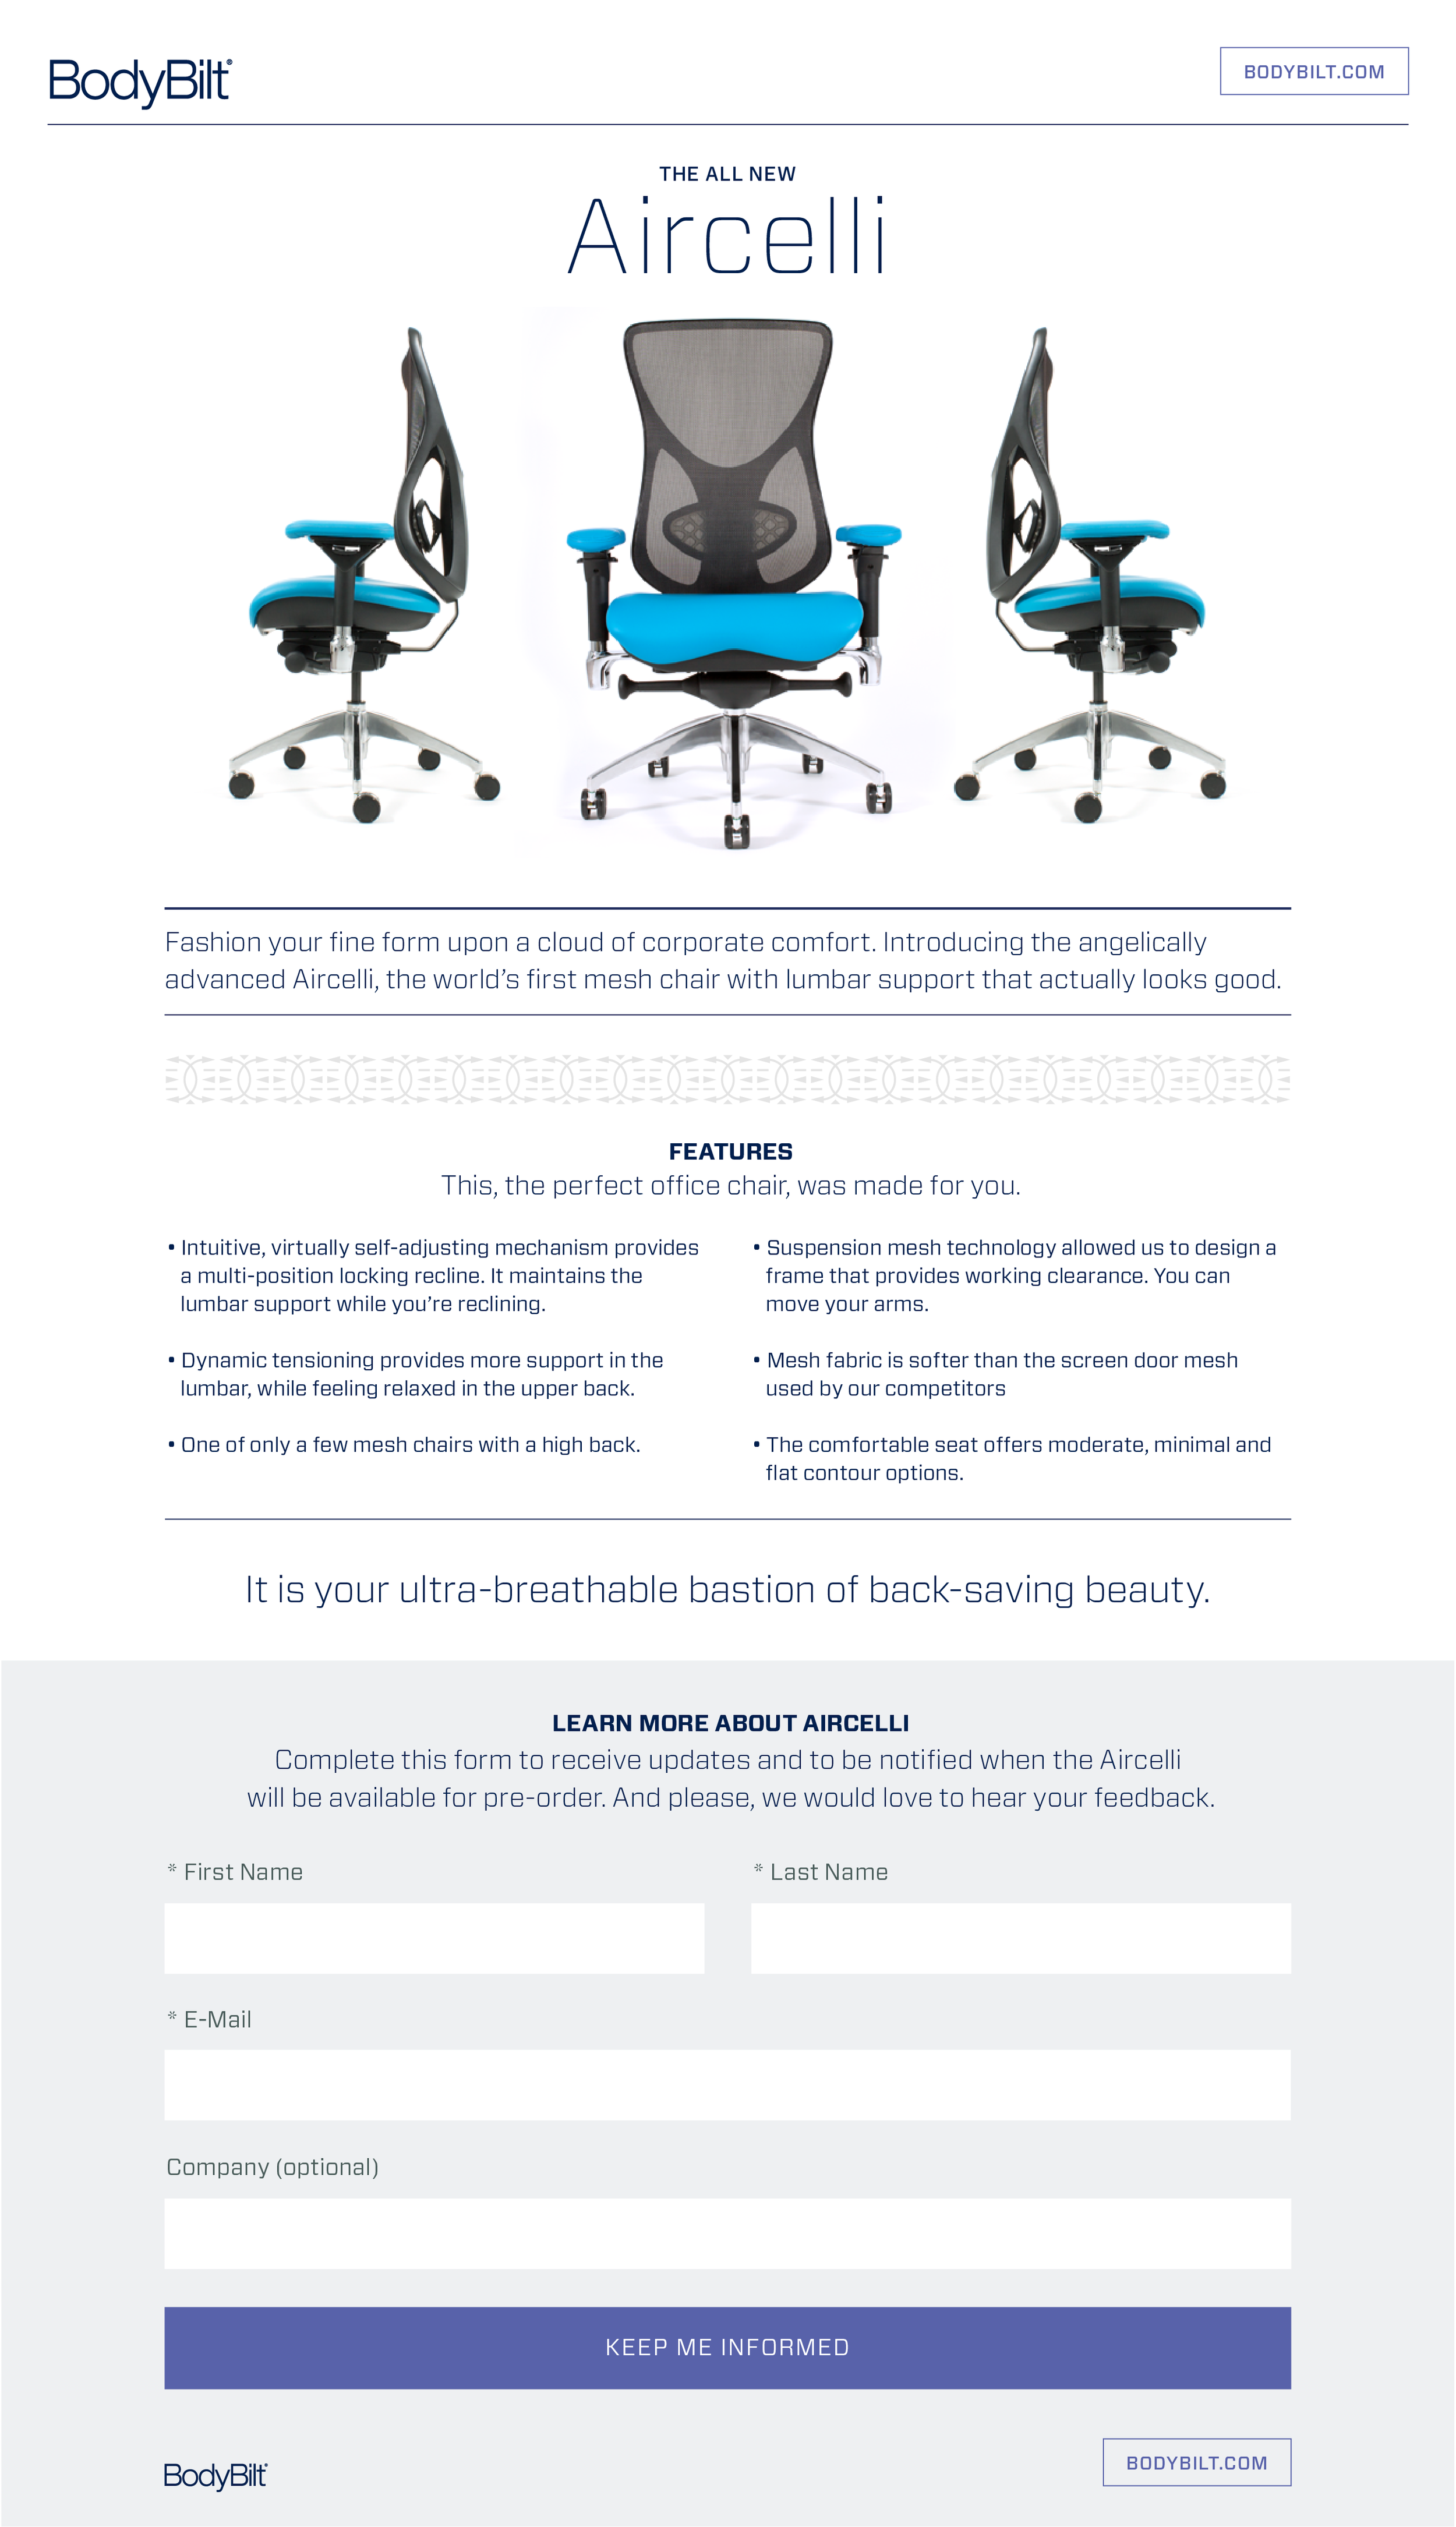 BB_Aircelli_Landingpage_Ergonomic_Chair.png